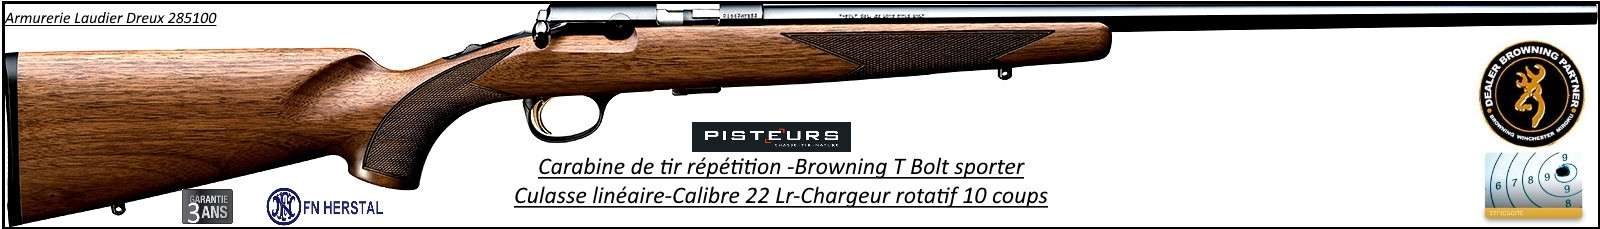 Carabine Browning T bolt sporter threaded répétition calibre 22 Lr-crosse bois-chargeur 10 coups-Promotion-Ref 20595